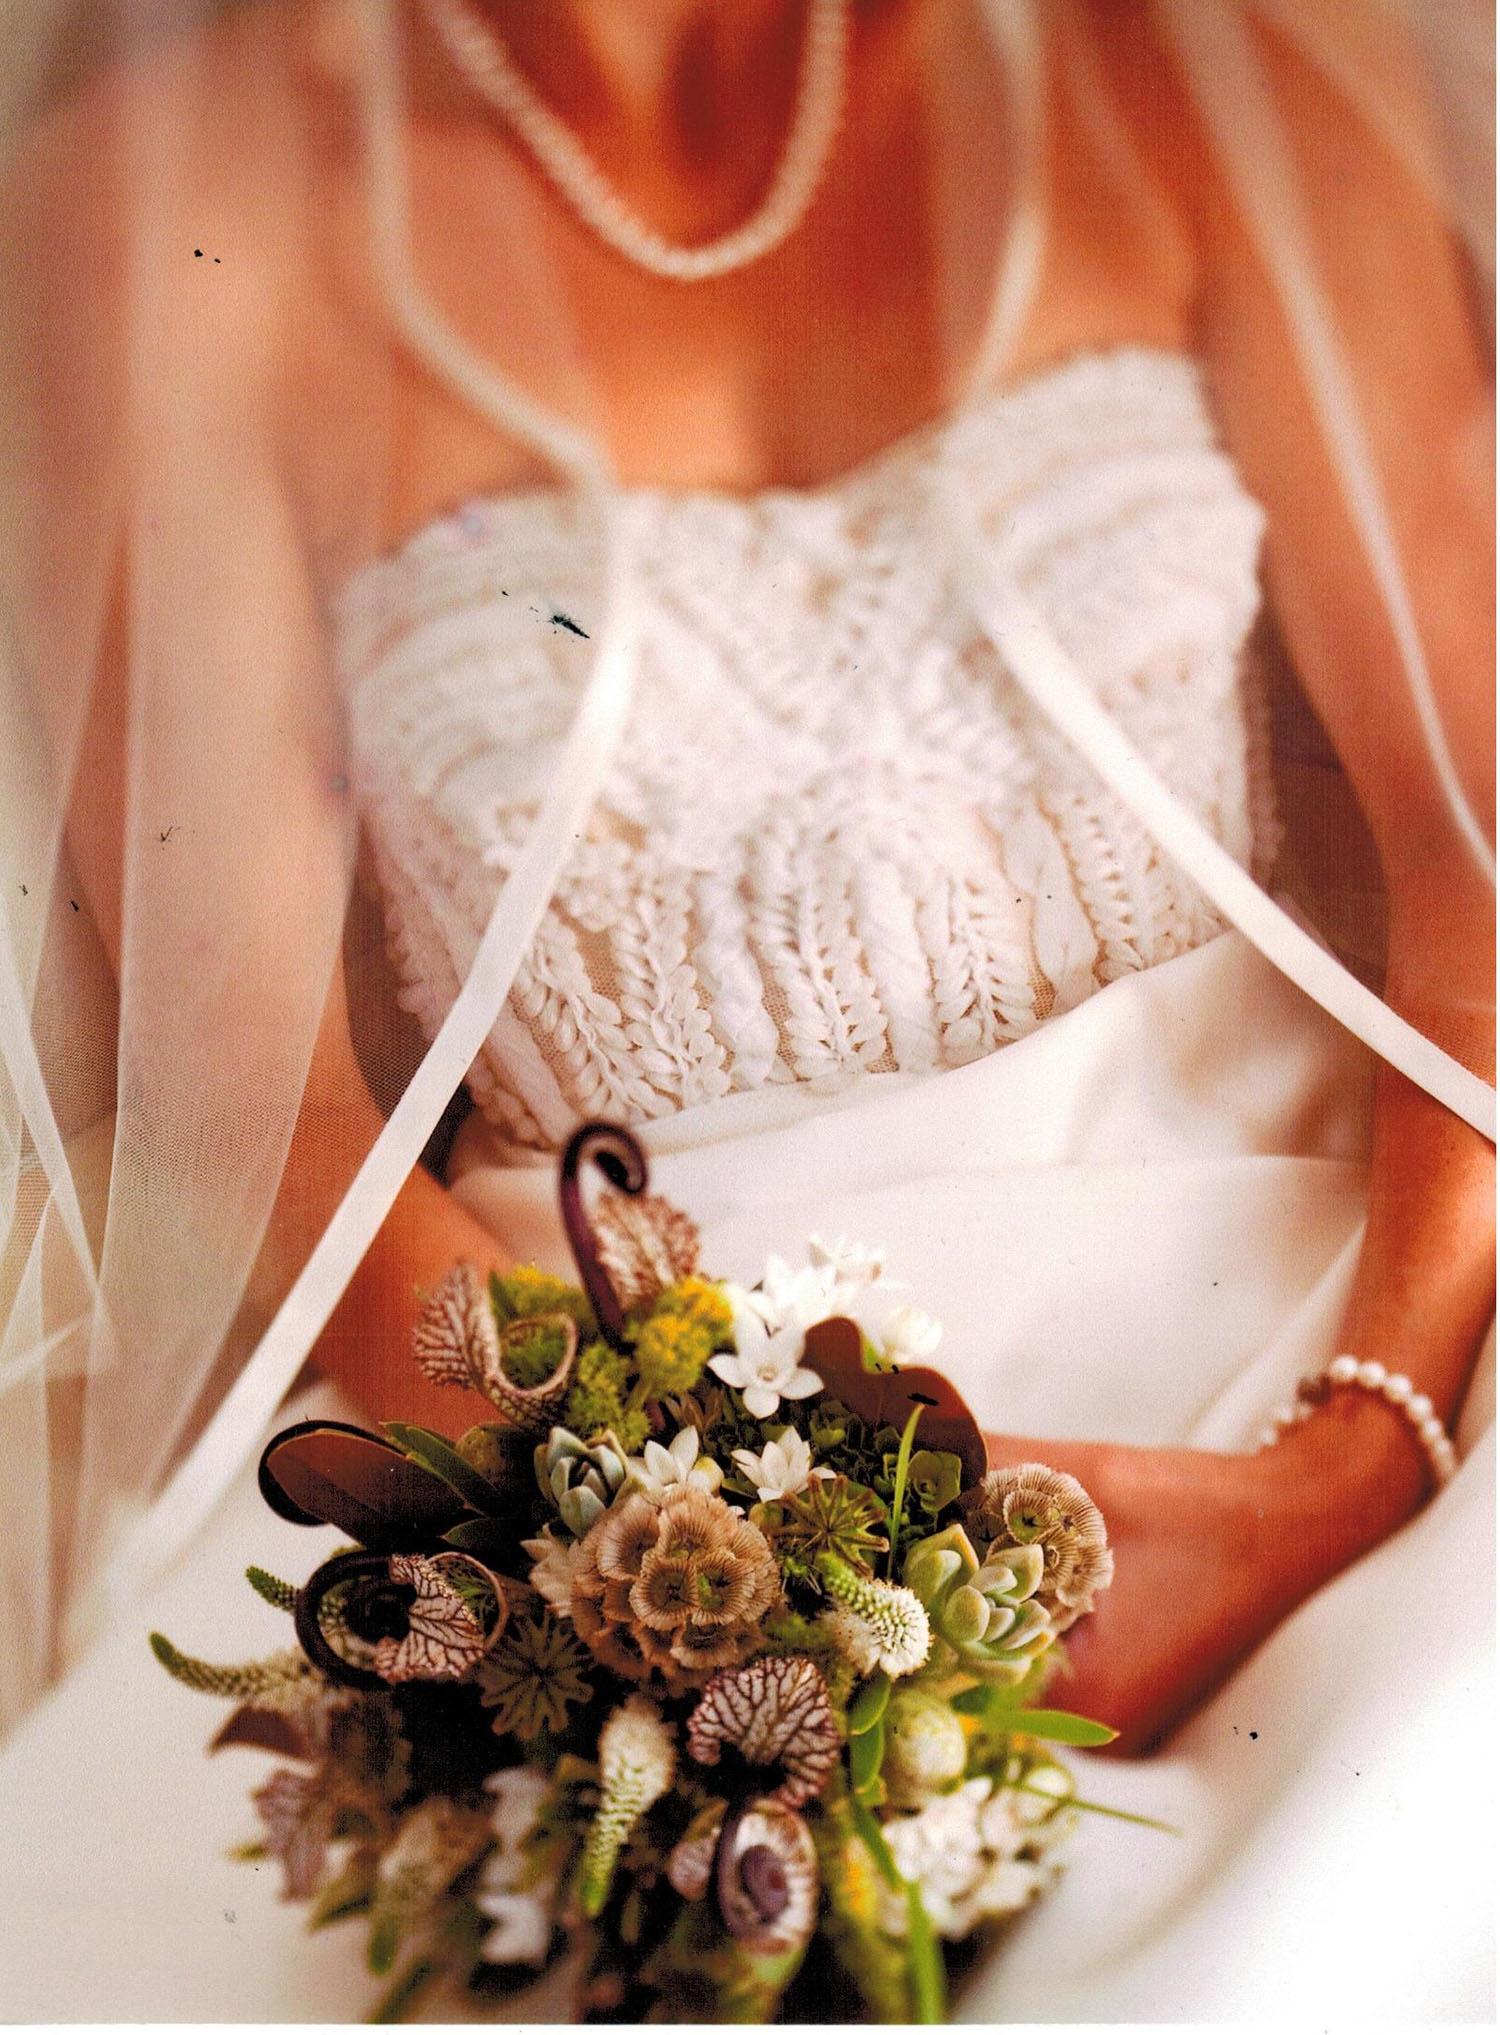 Tyler Boye Photography  | Wedding Reception | The Hotel Dupont, Wilmington, DE